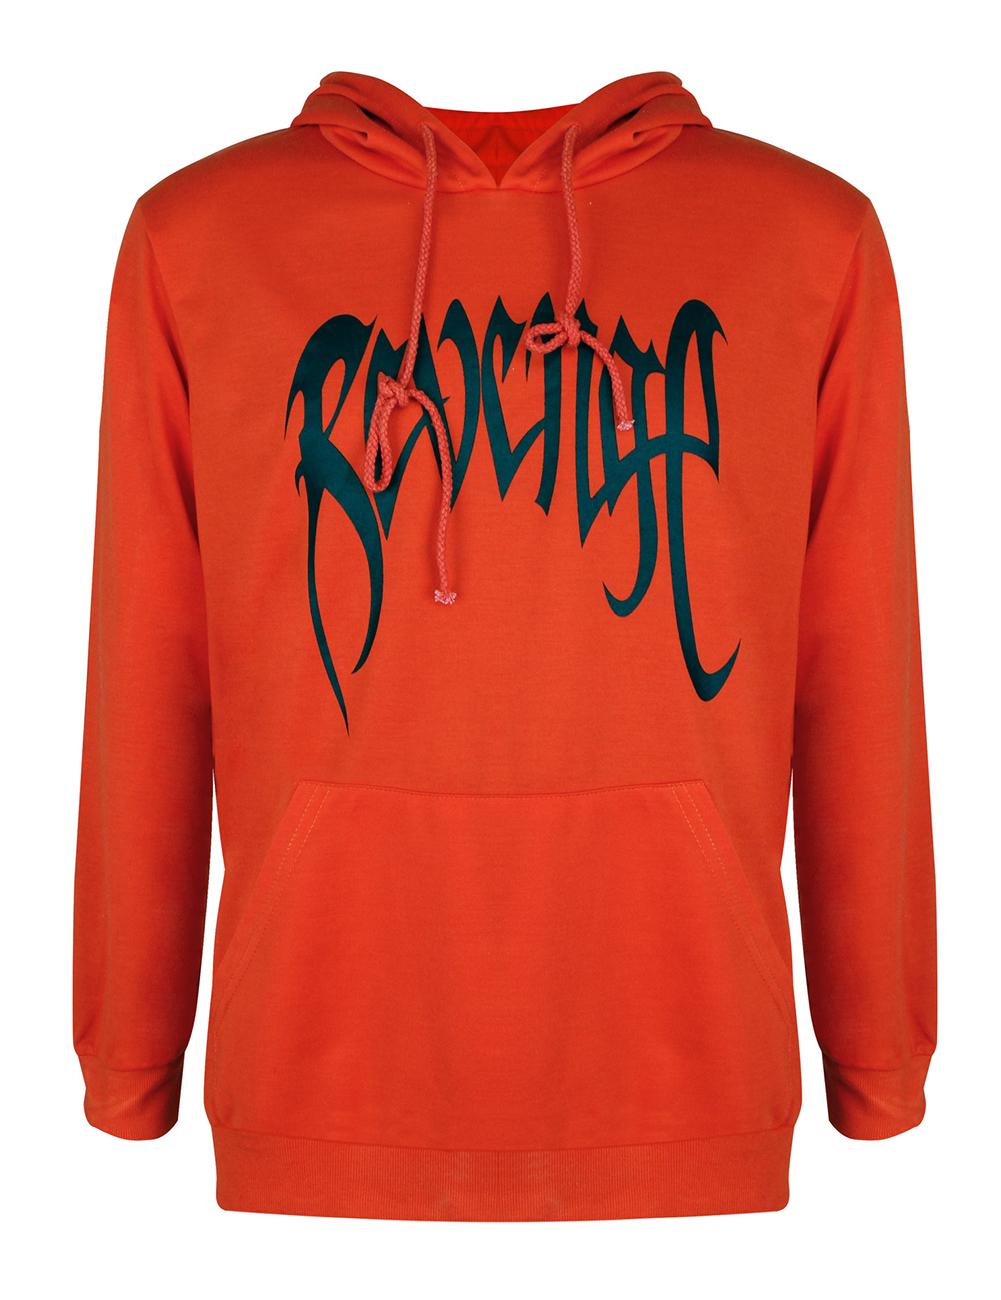 be8454e41586e9 XXXTentacion REVENGE KILL Hoodie Men s Print Bad Vibes Forever Sweatshirt  Tops